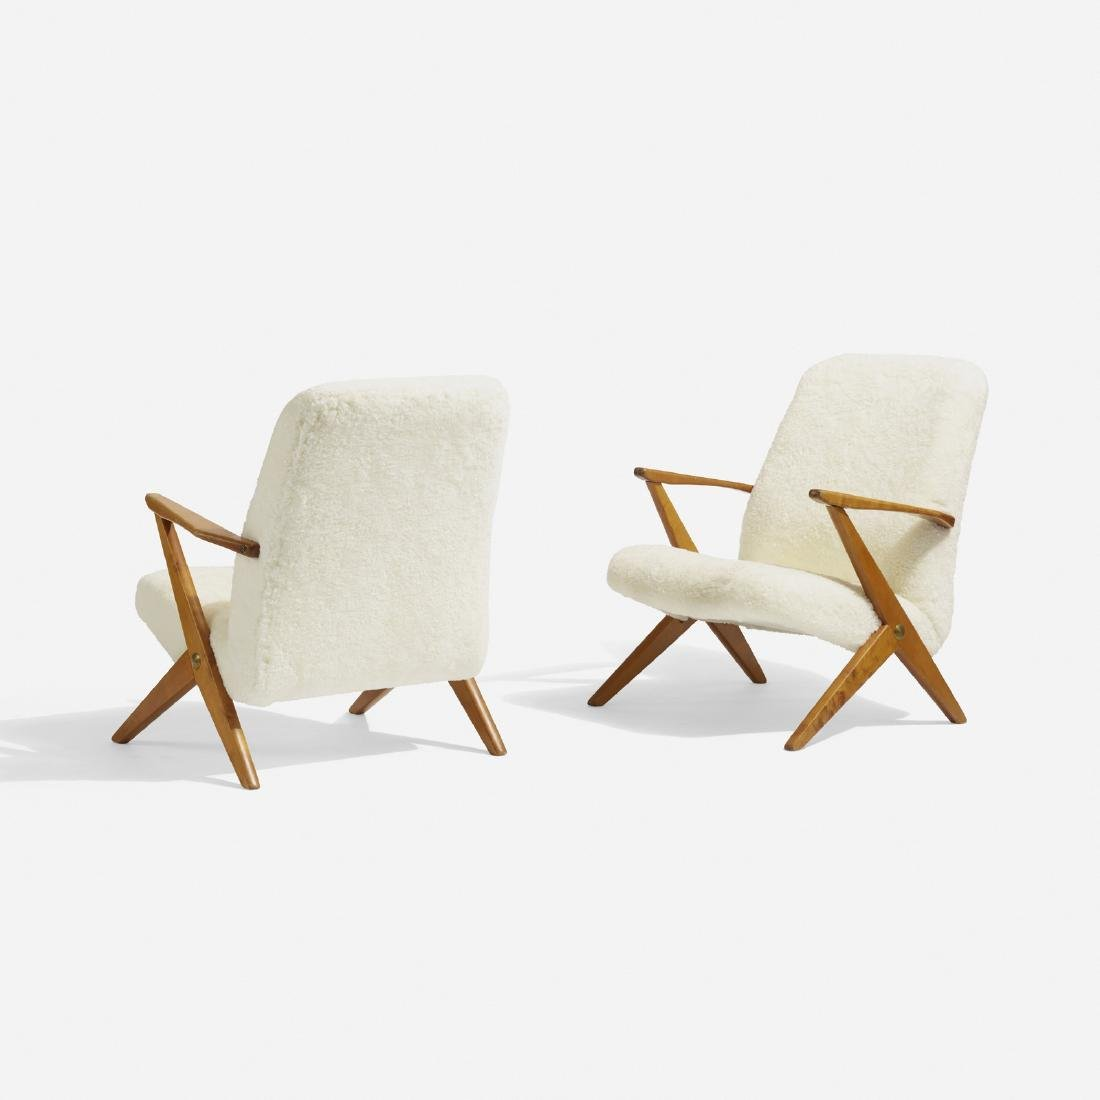 Bengt Ruda, lounge chairs, pair - 2